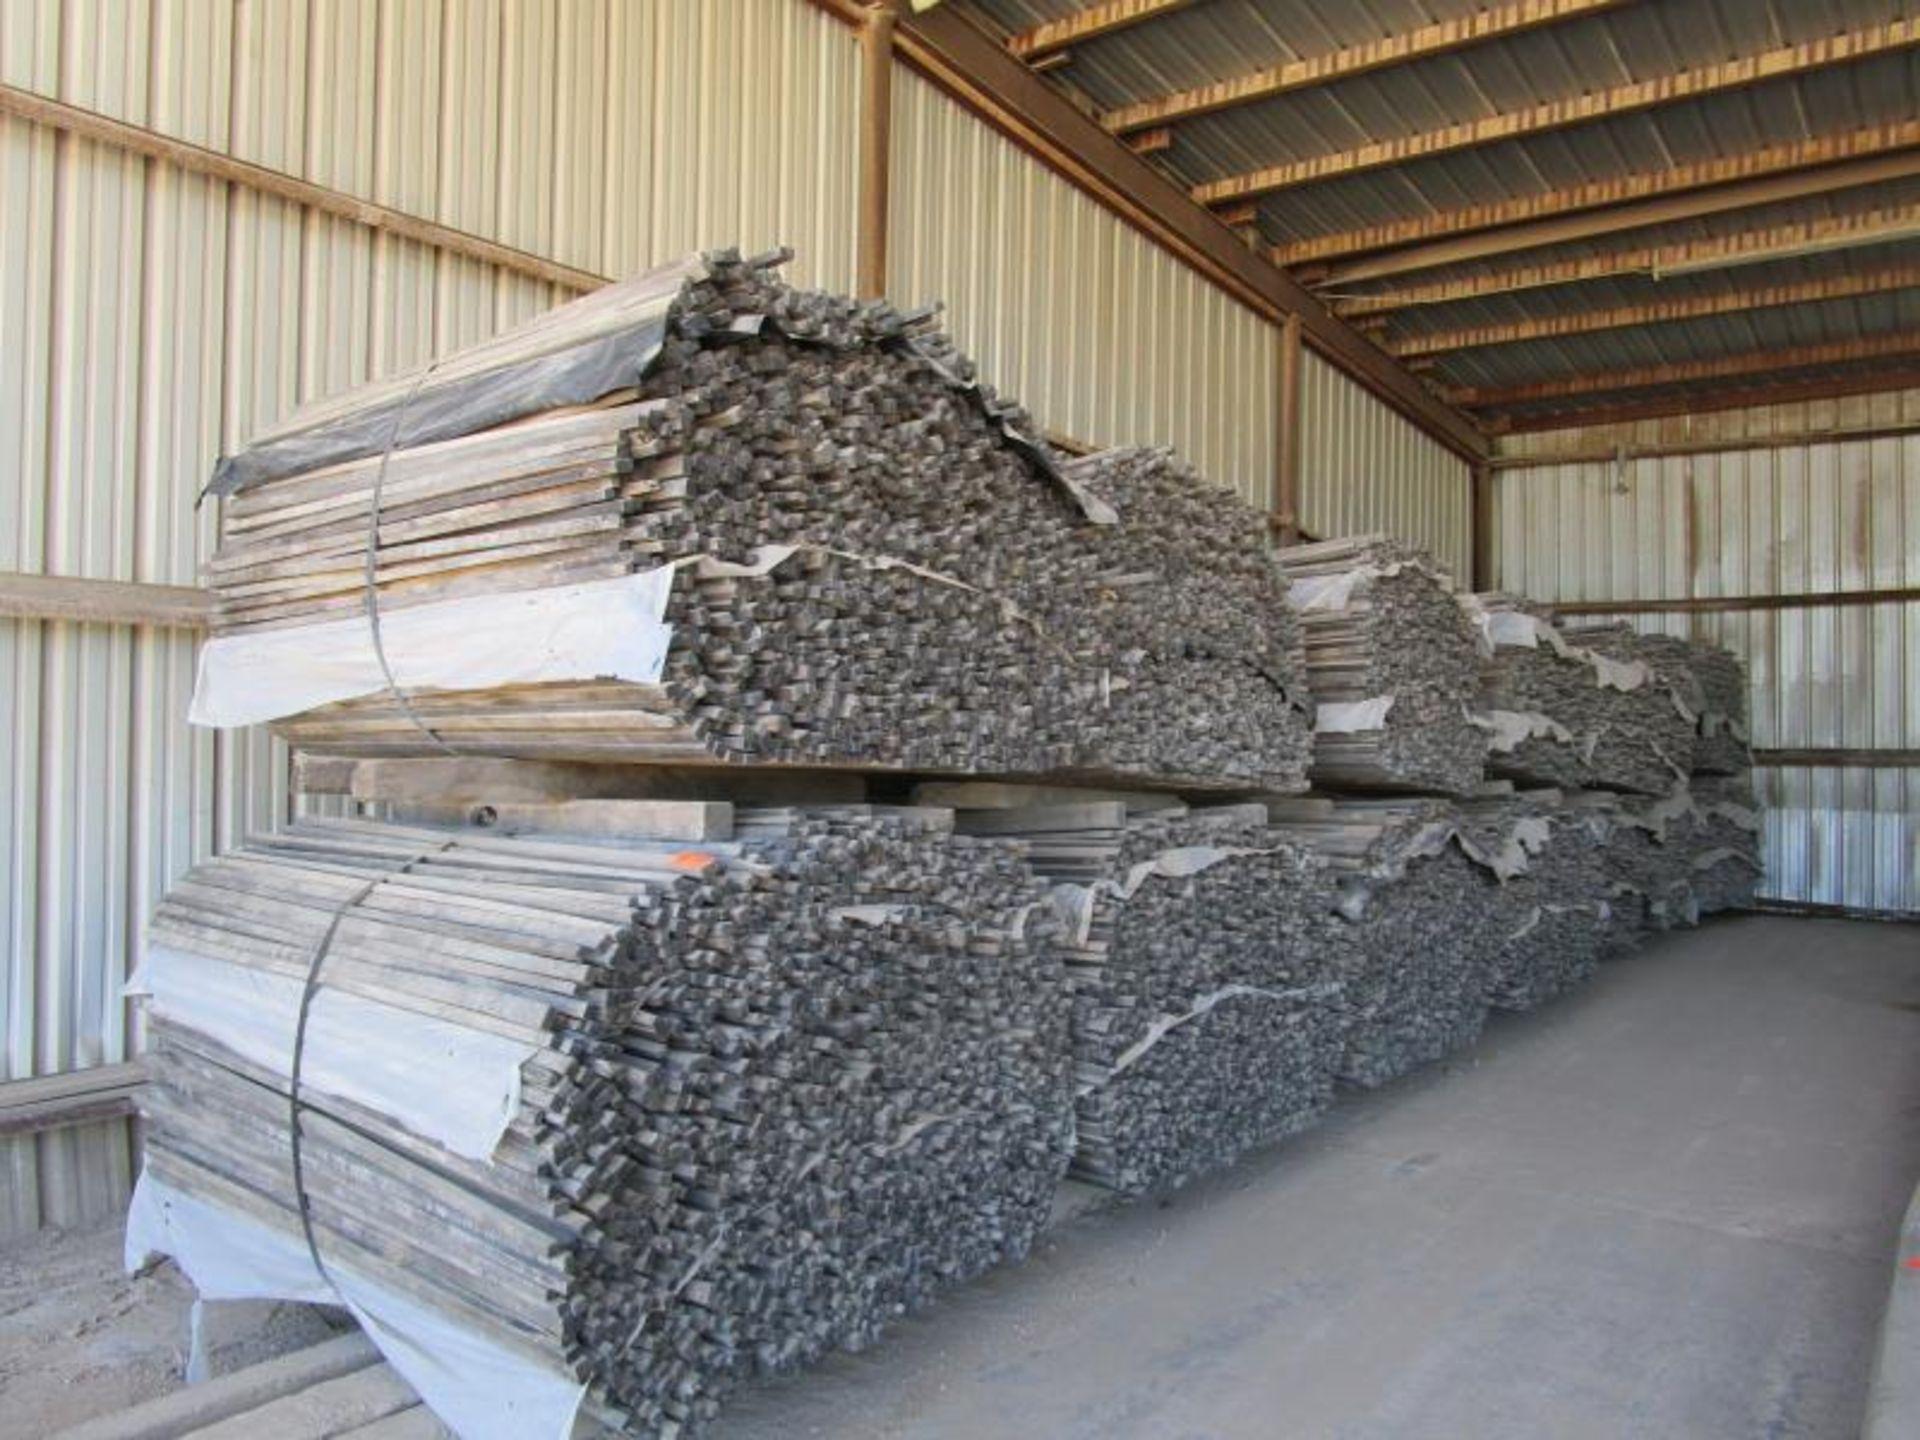 (16) Bundles of wood sticks